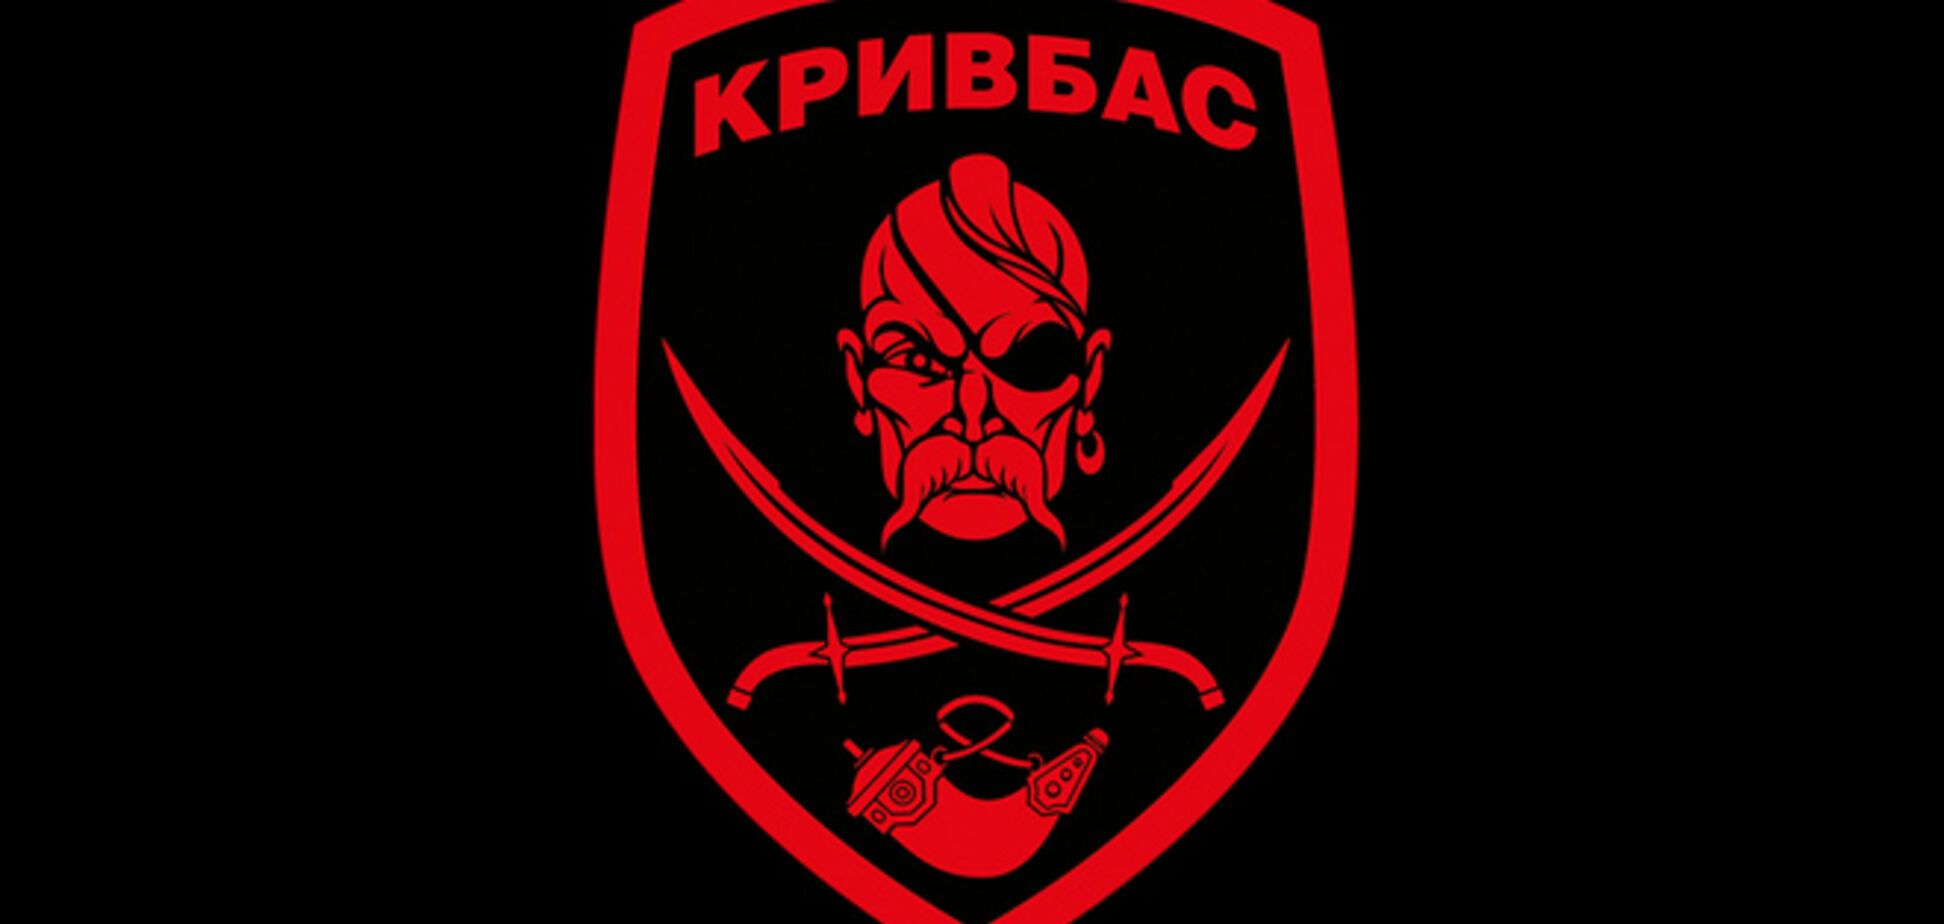 Генштаб прокомментировал ситуацию по батальону 'Кривбасс'